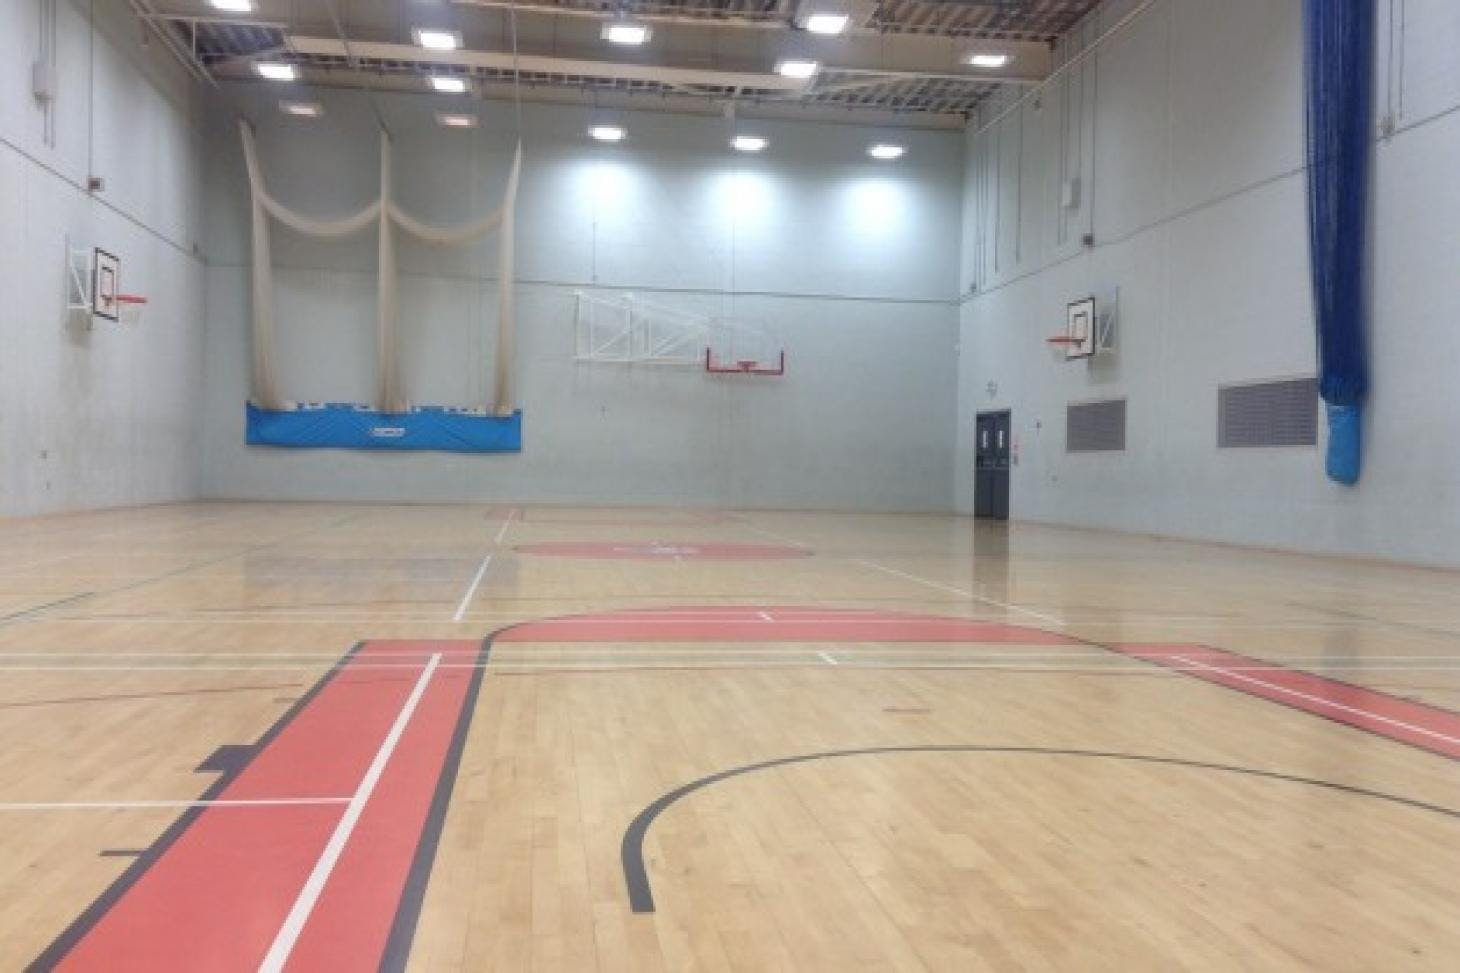 Northfleet Technology College Nets   Sports hall cricket facilities